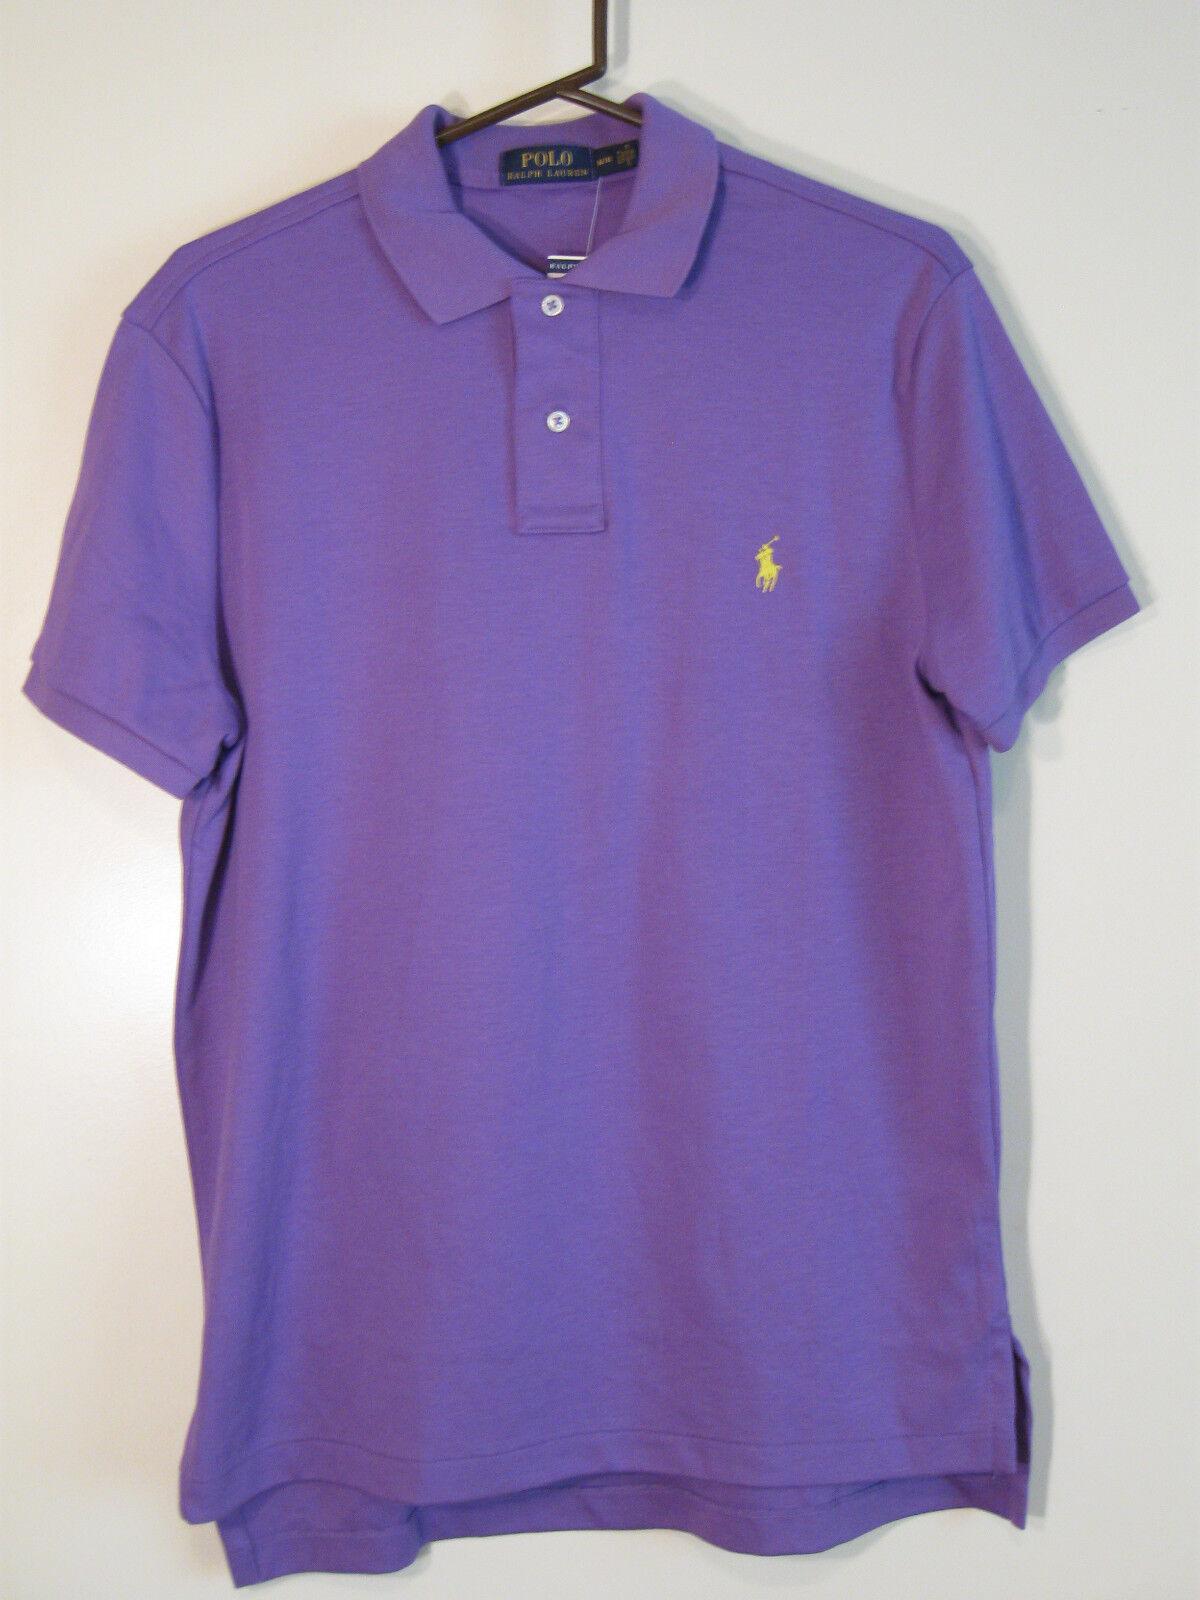 POLO Ralph Lauren Mens 2 Button Shirt NWT M Short Sleeves 100% Cotton